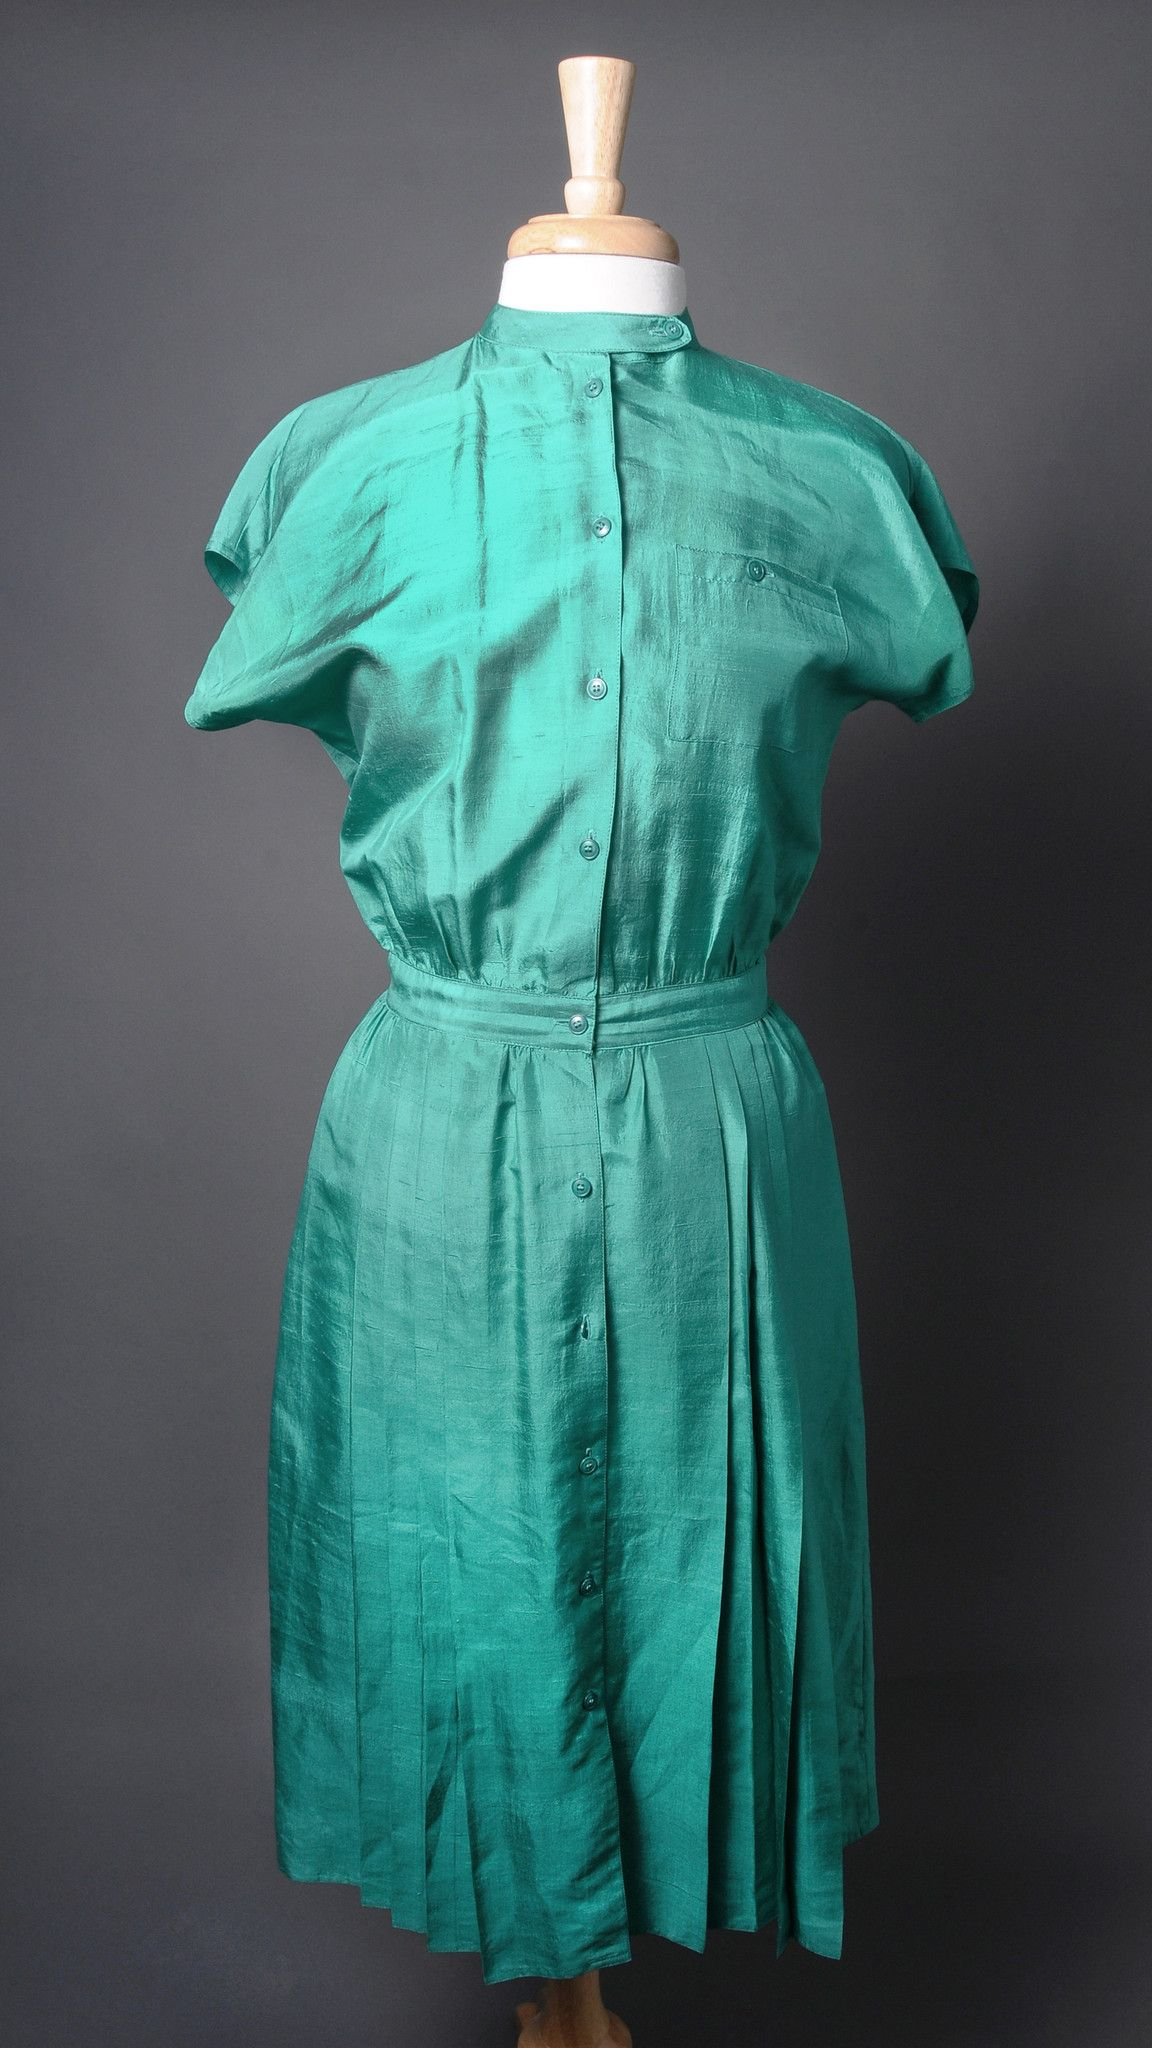 Maggy London Shamrock Green Daytime Dress